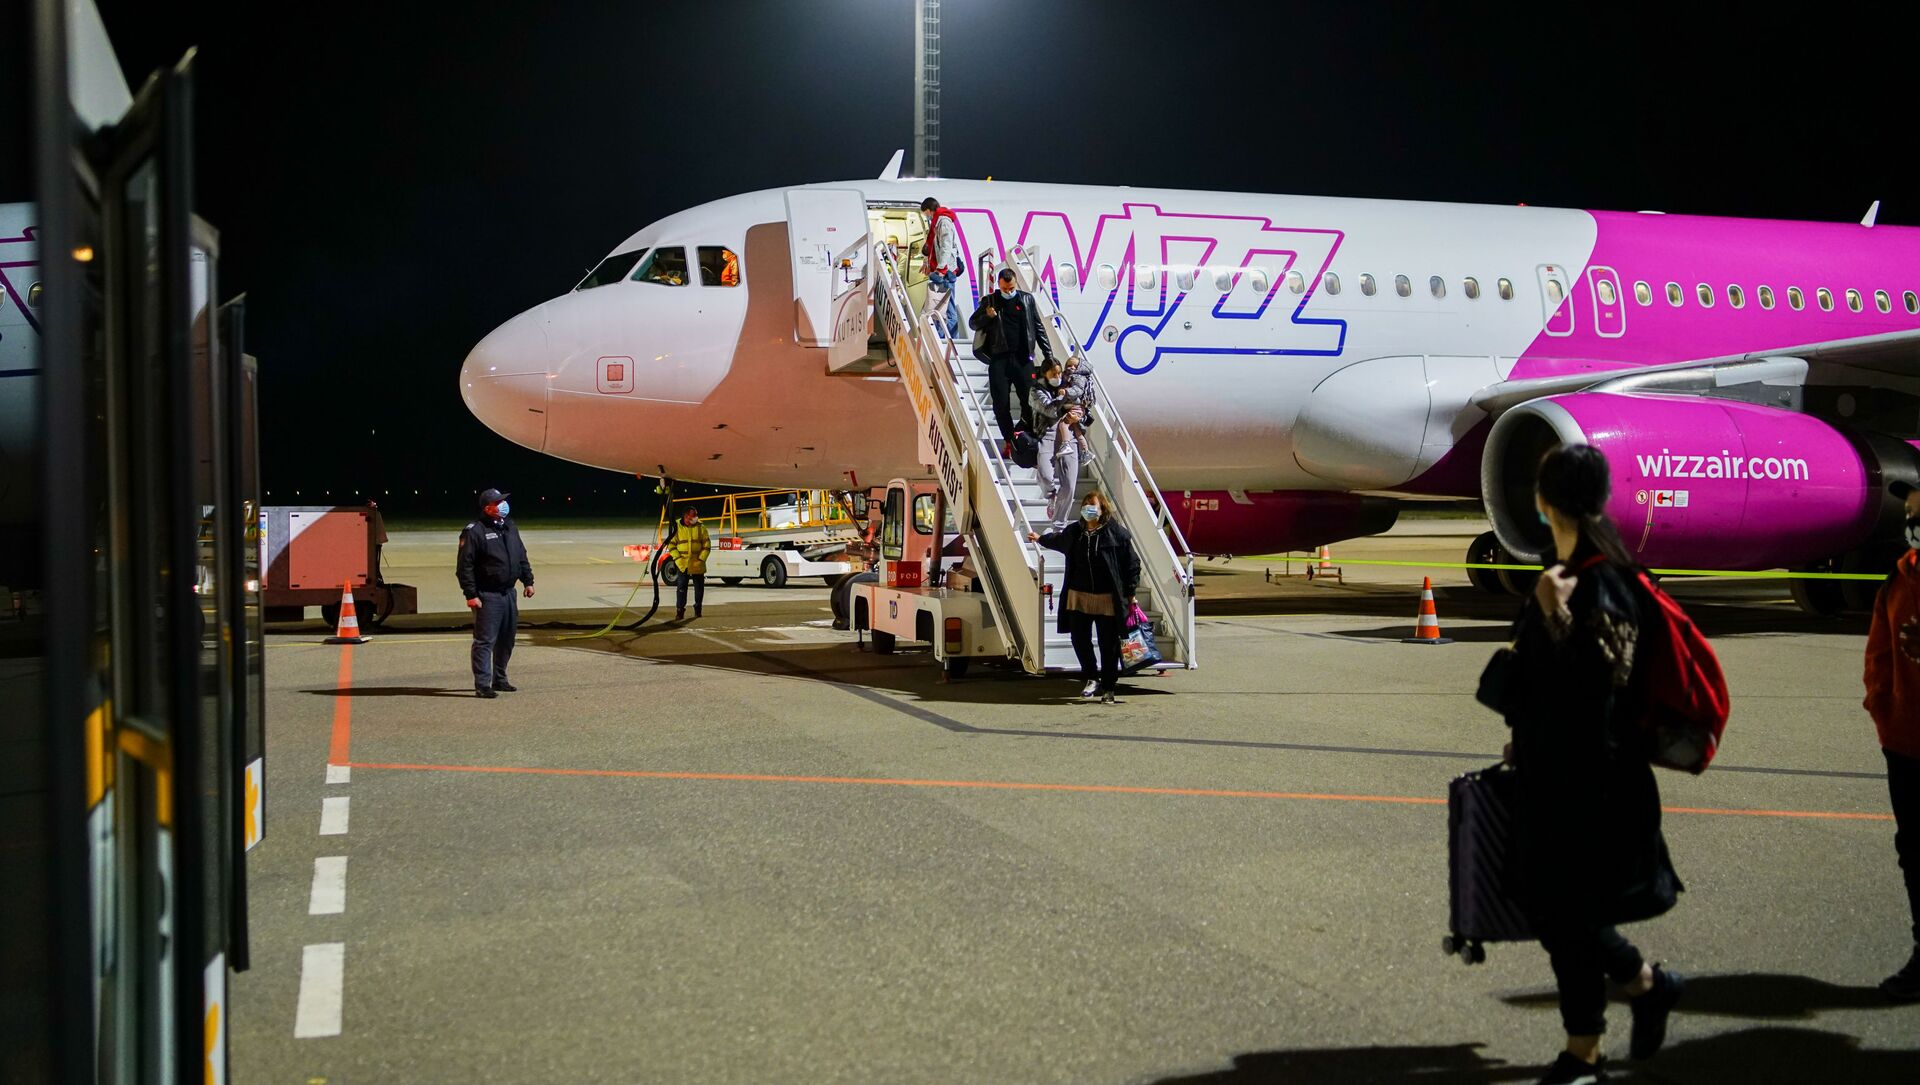 WizzAir-ის თვითმფრინავი - Sputnik საქართველო, 1920, 29.06.2021